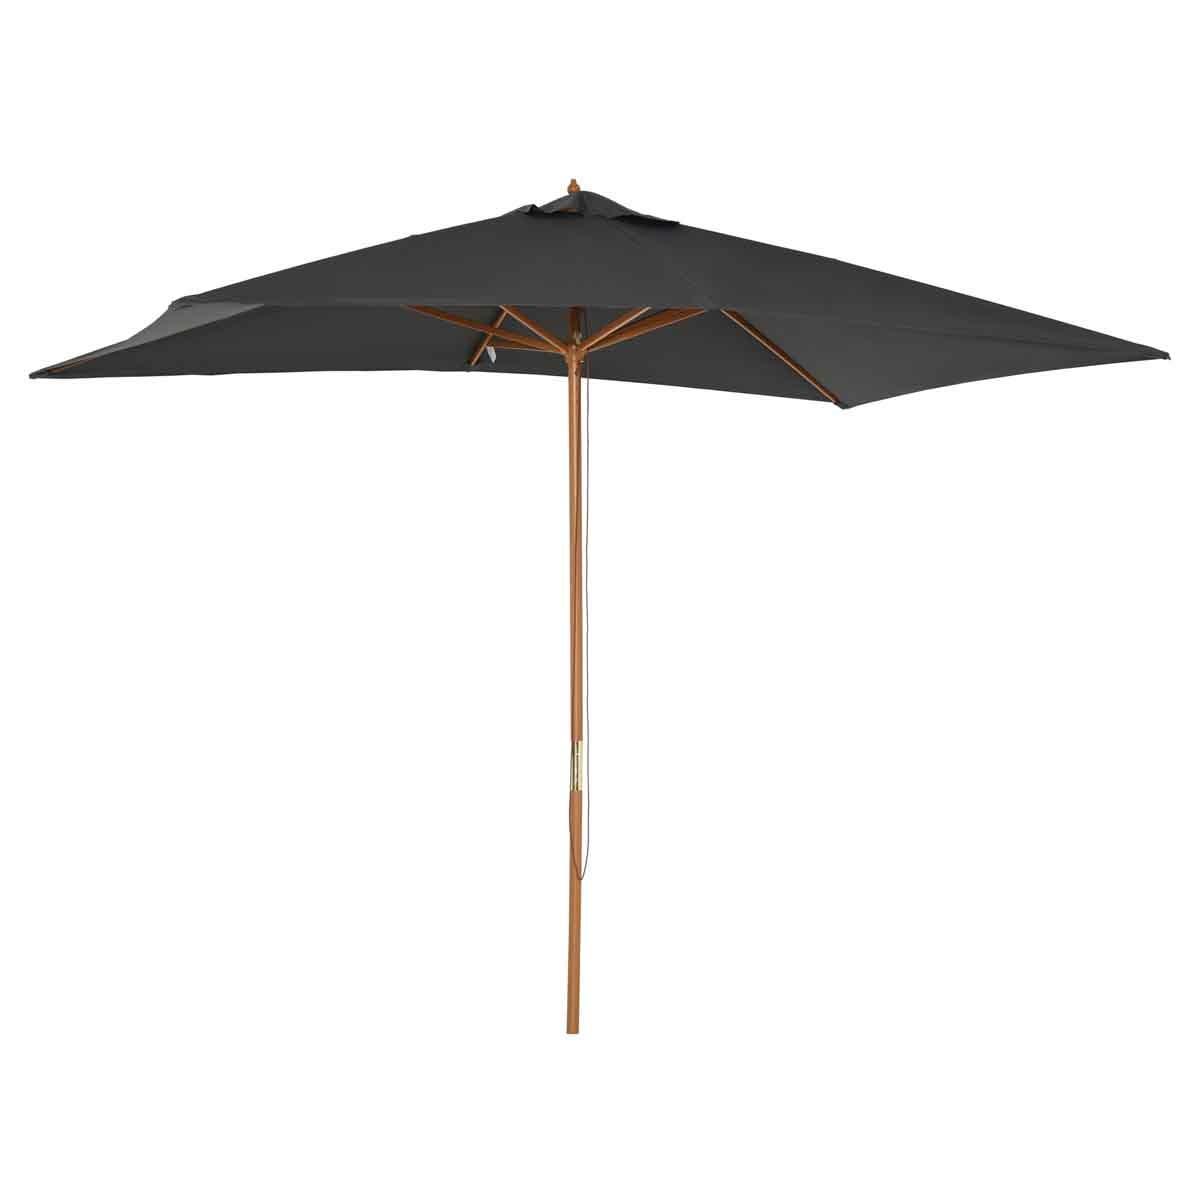 Outsunny Wooden Rectangular Parasol - Grey